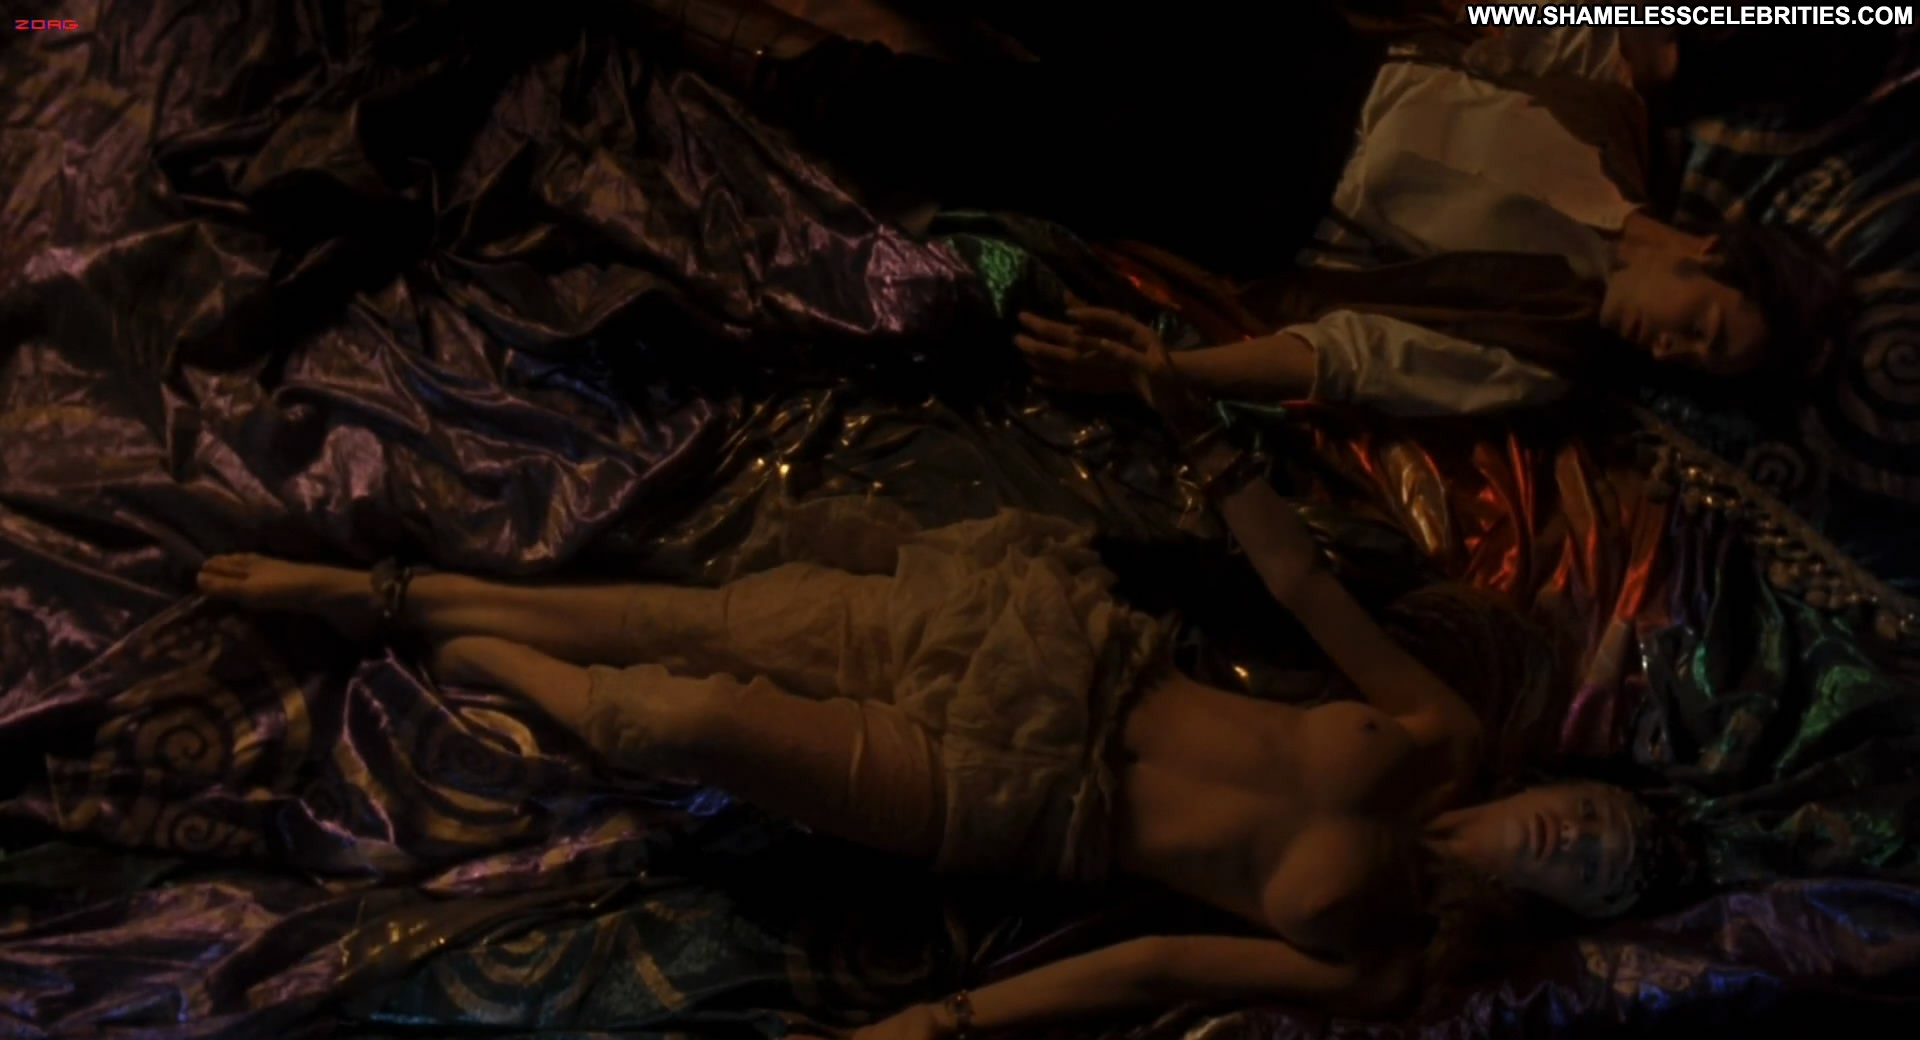 Monica Bellucci Irreversible Sex Scenes Porn Videos